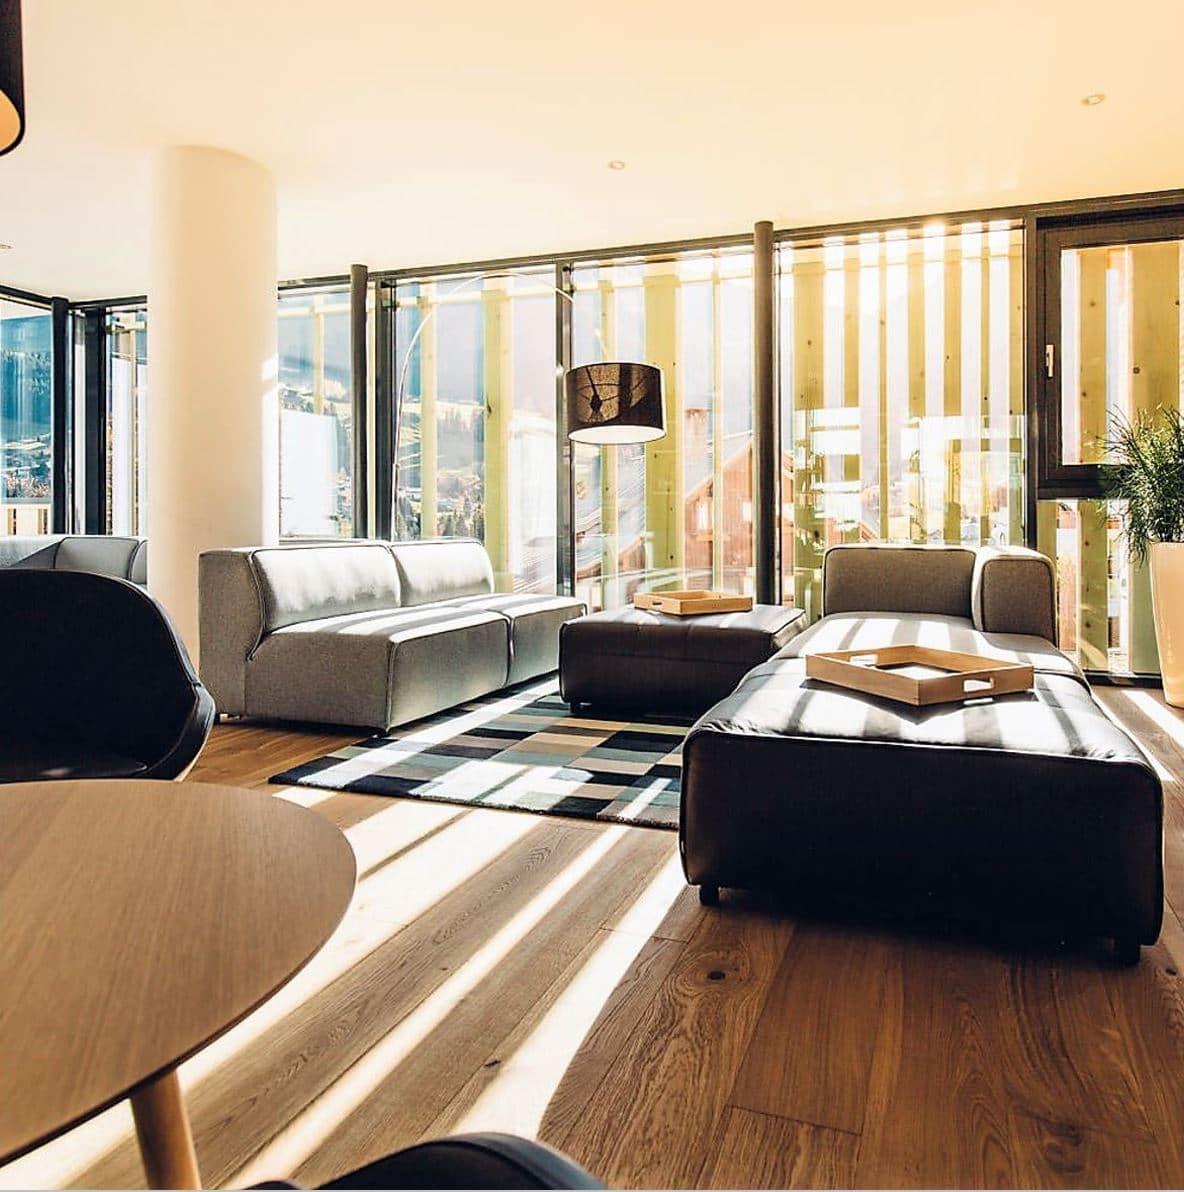 boconcept experience sonnenburg 3 - Hotel Sonnenburg - BoConcept Business